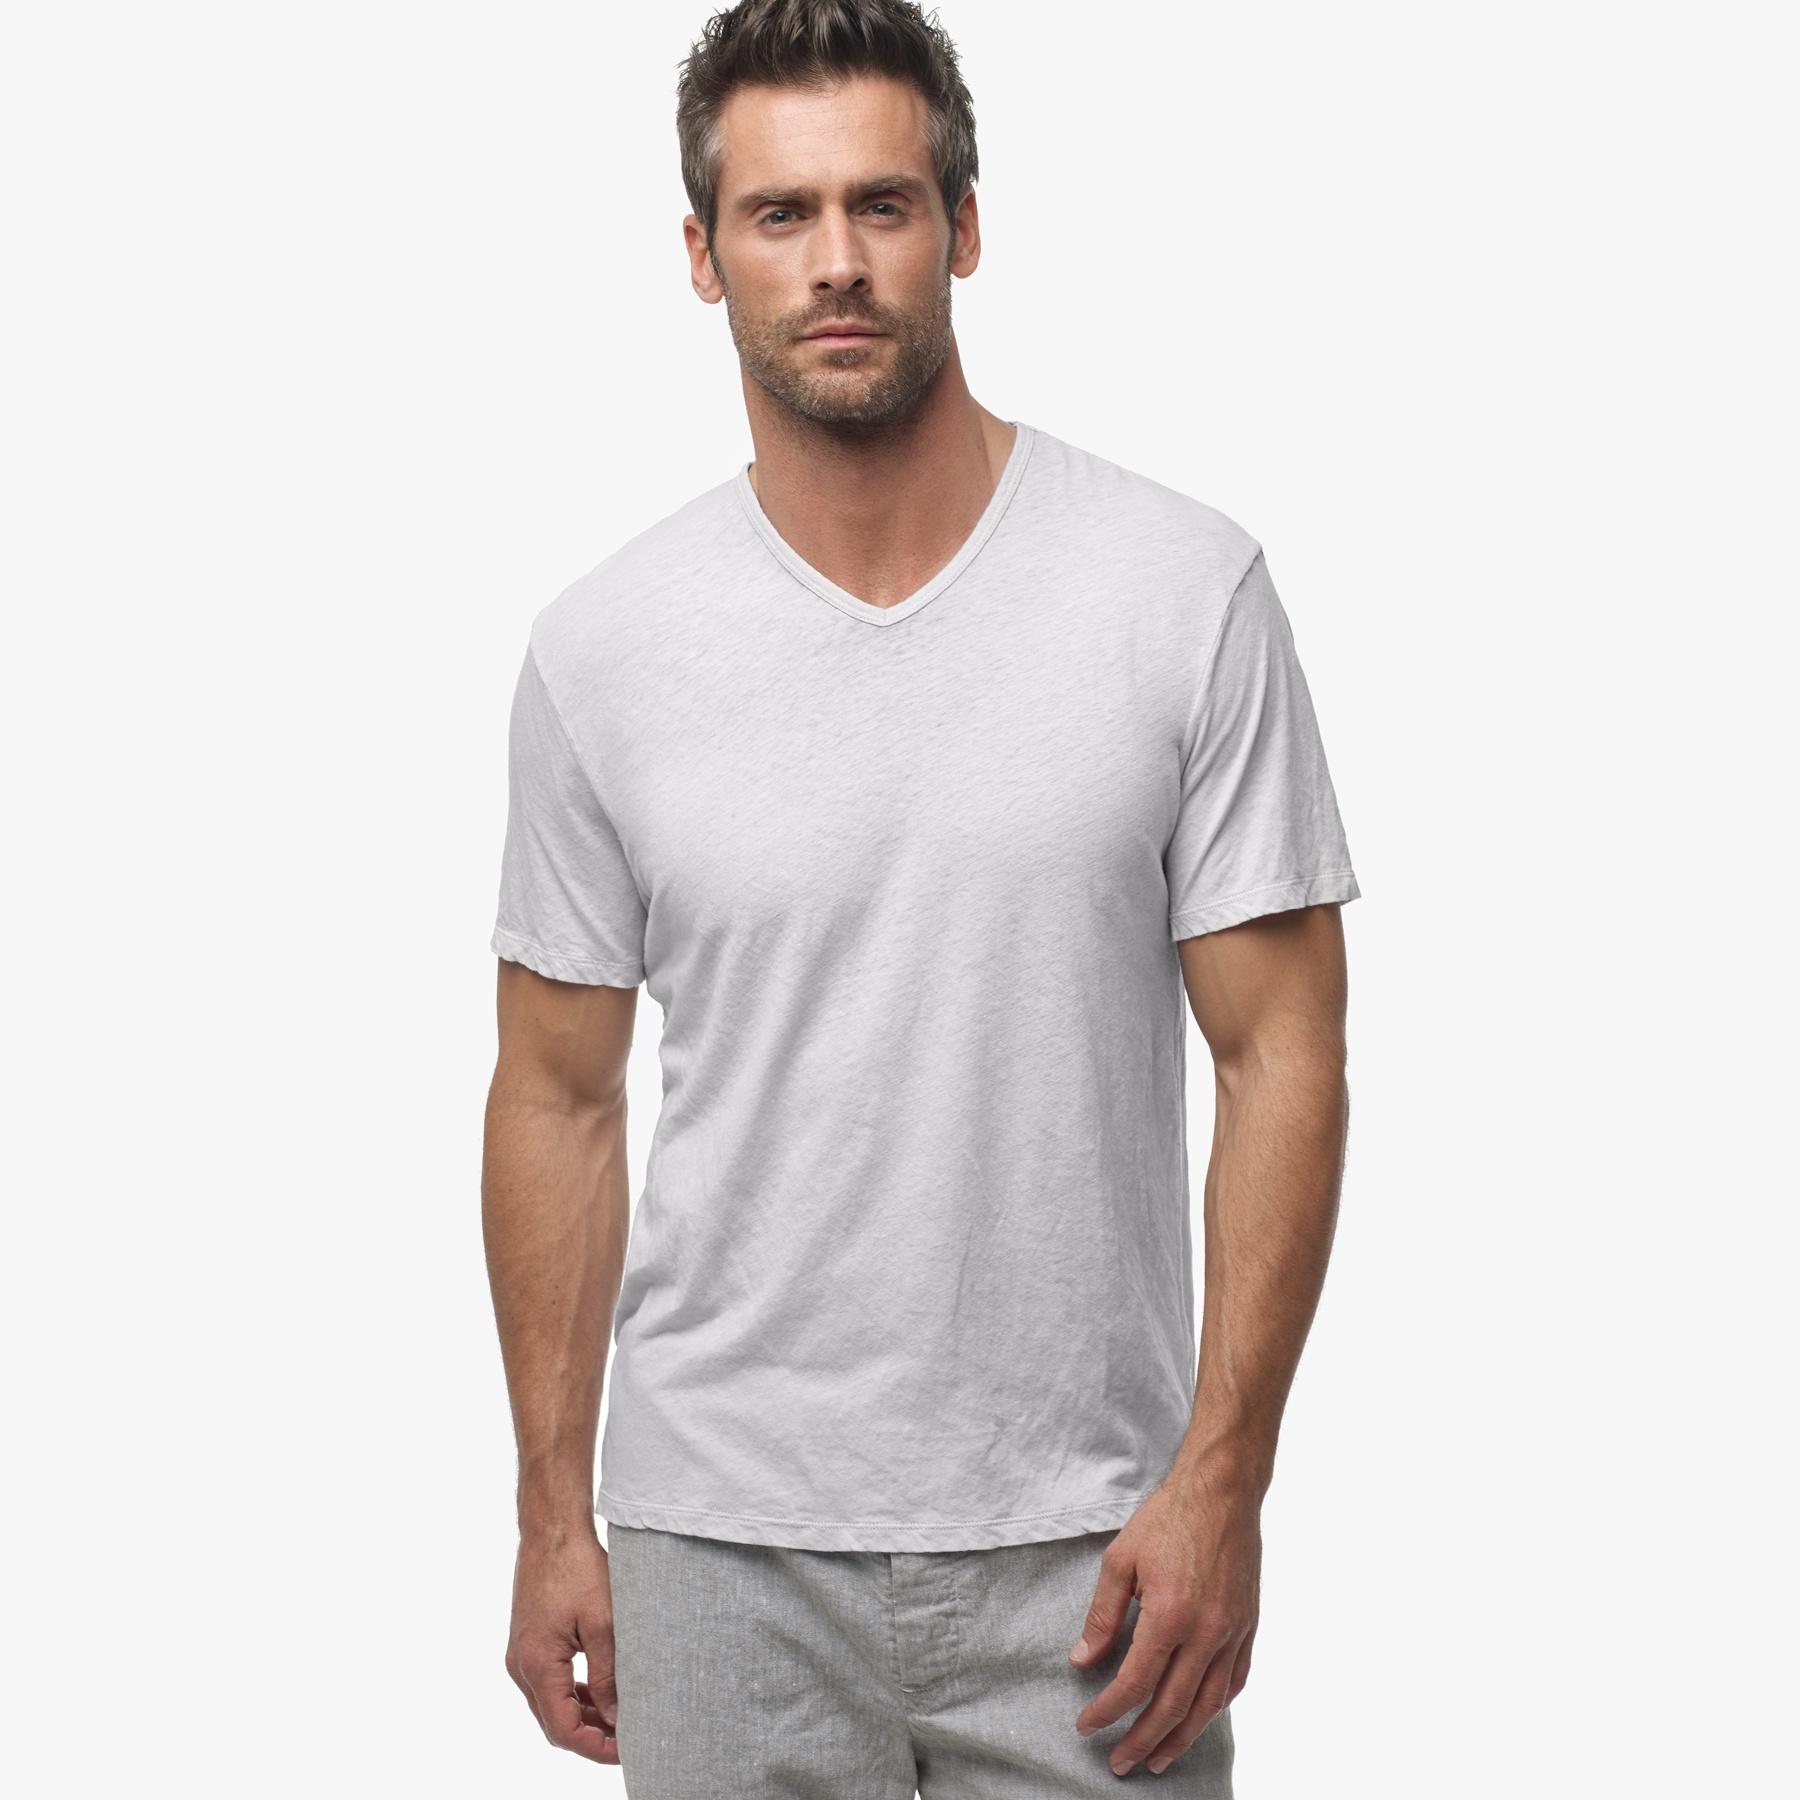 388134b38d0 James Perse Cotton Linen V-neck in White for Men - Lyst